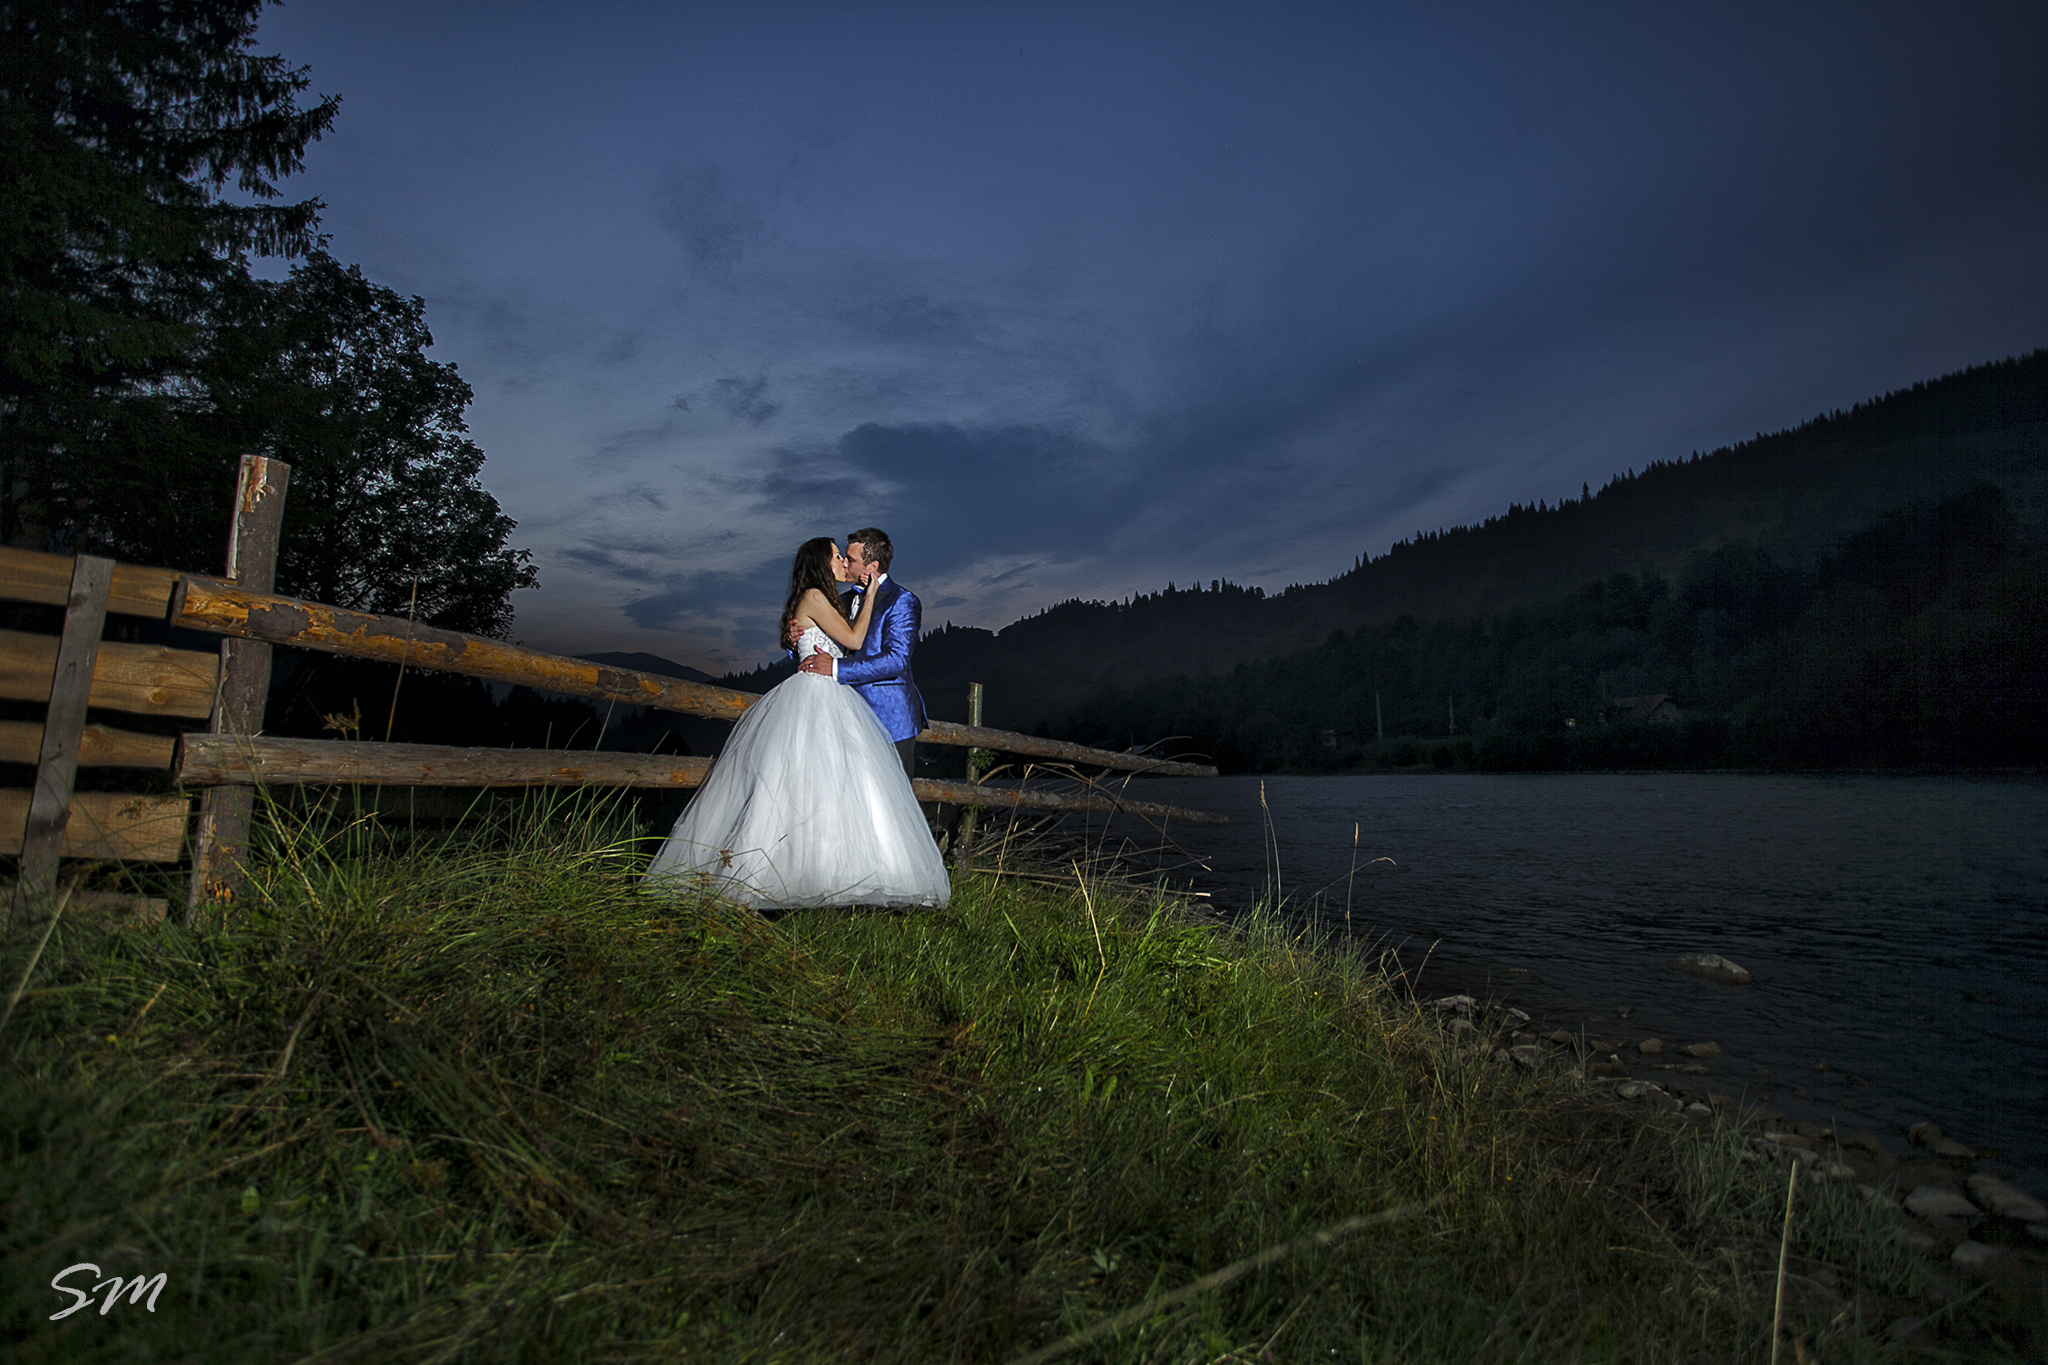 fotograf-nunta-suceava (14)